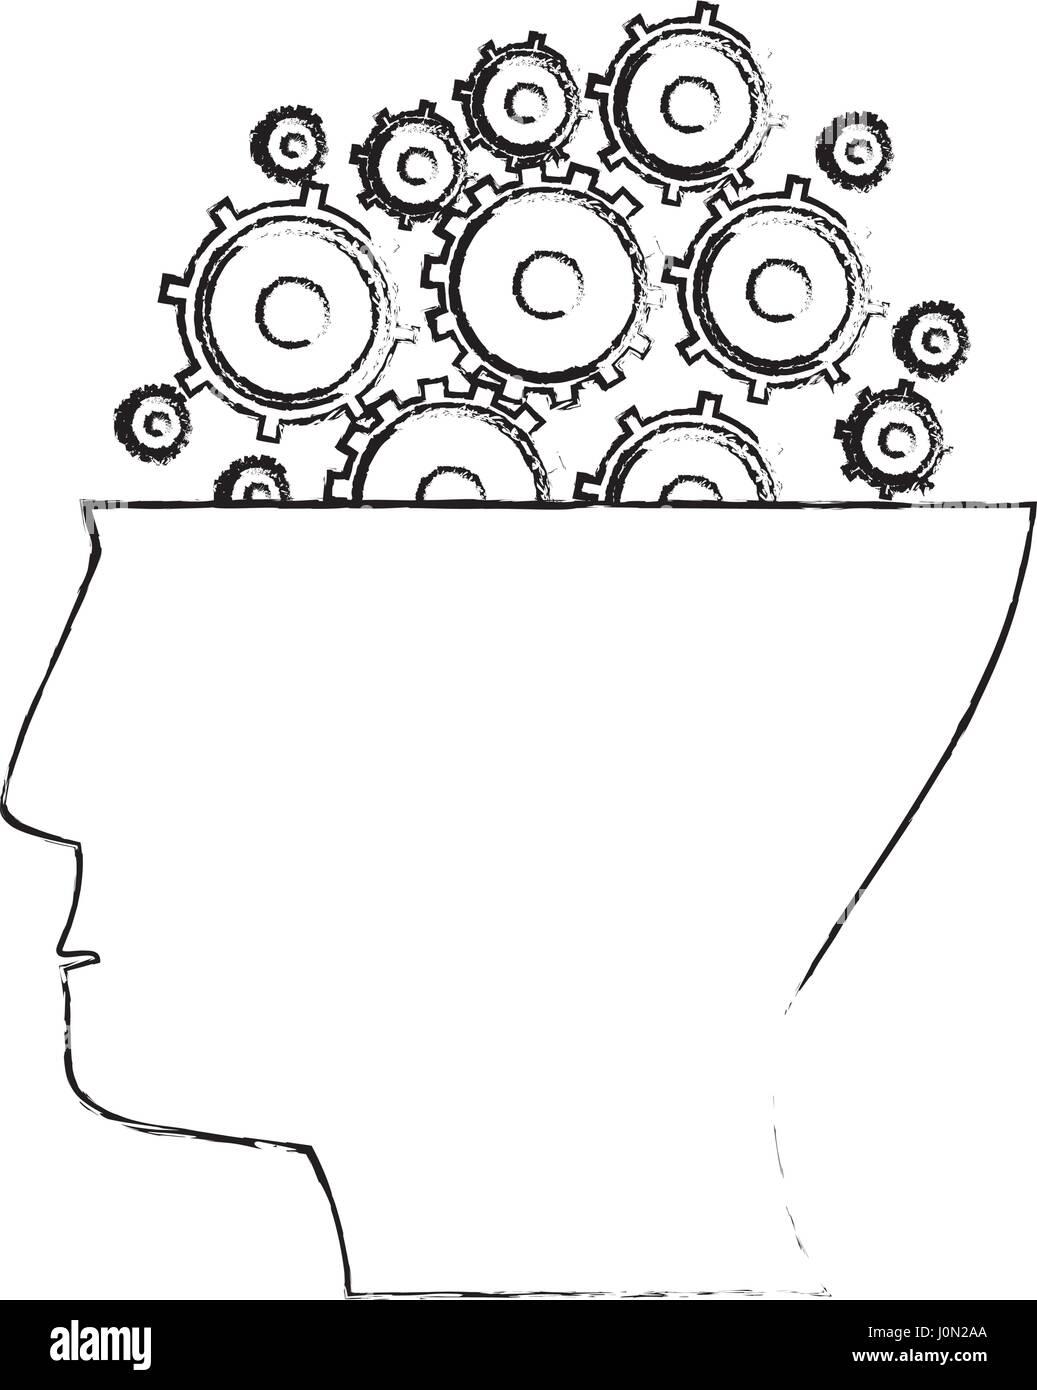 head human gear idea sketch - Stock Image